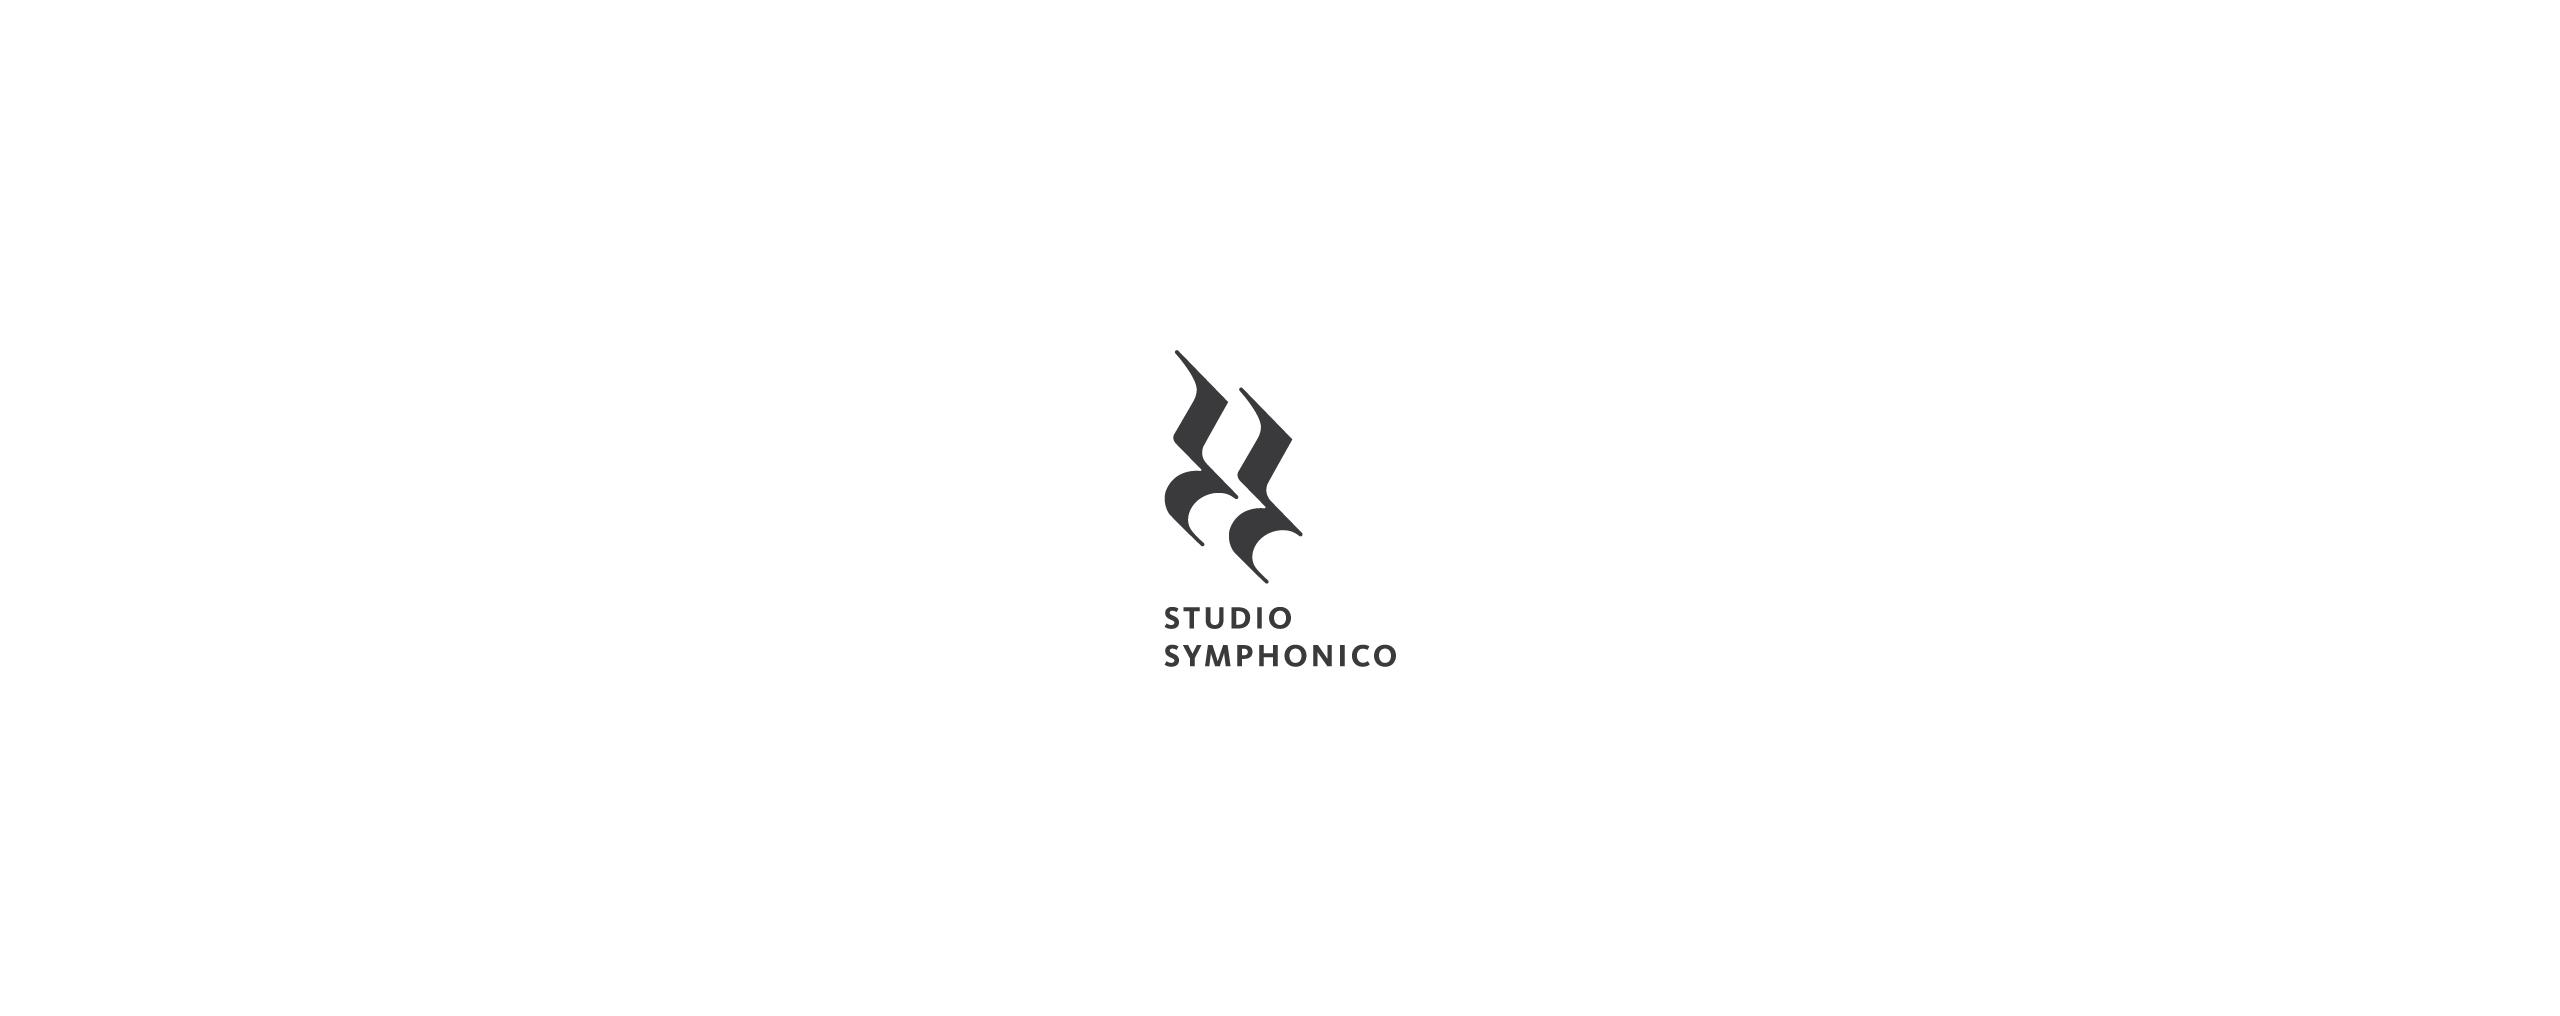 2_STUDIO_SYMPHONICO_LOGO